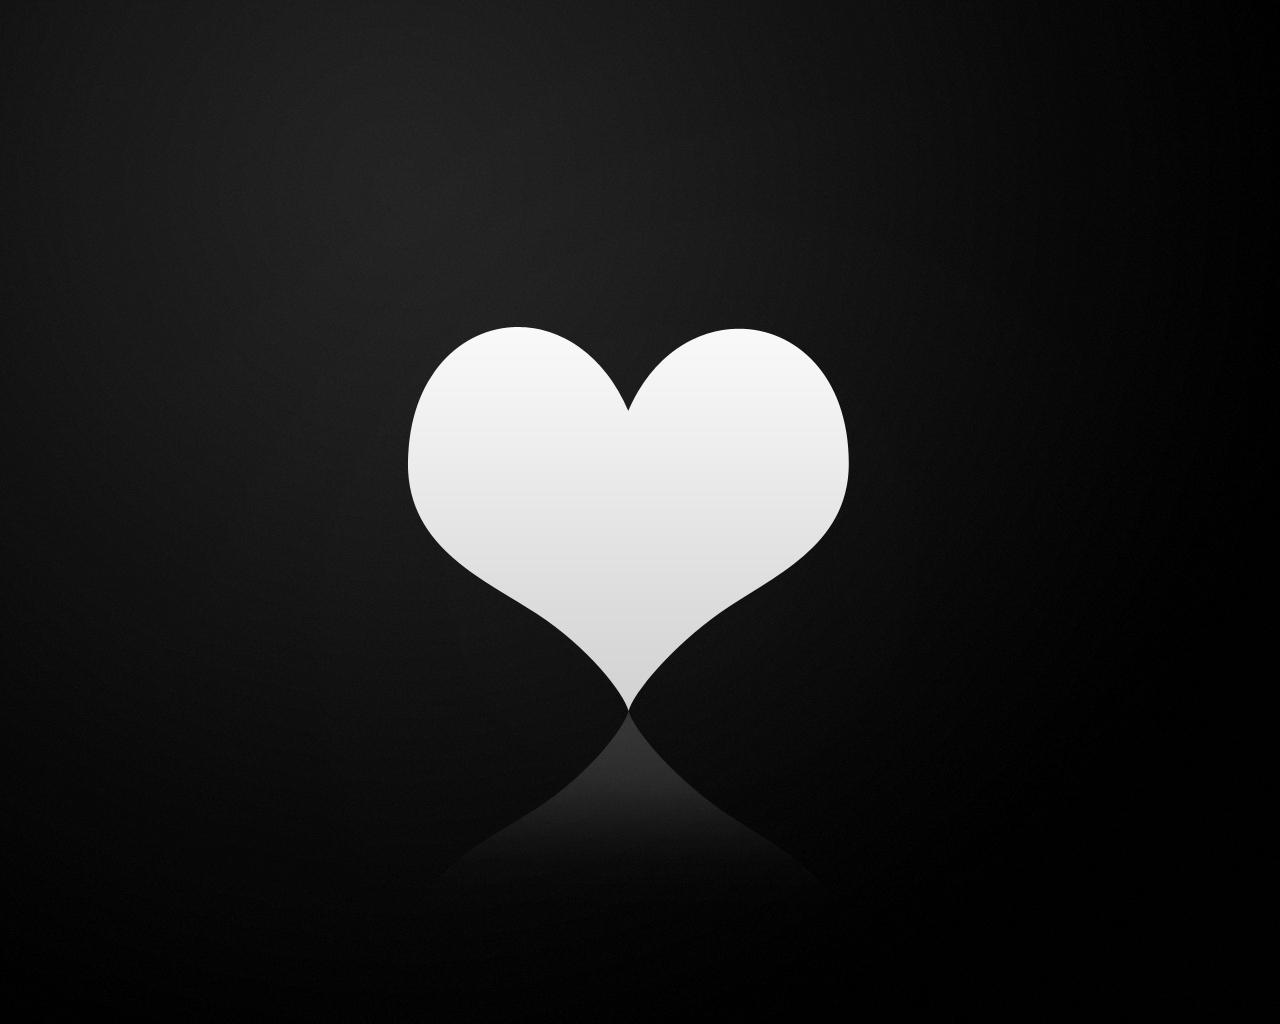 dark love wallpaper #17